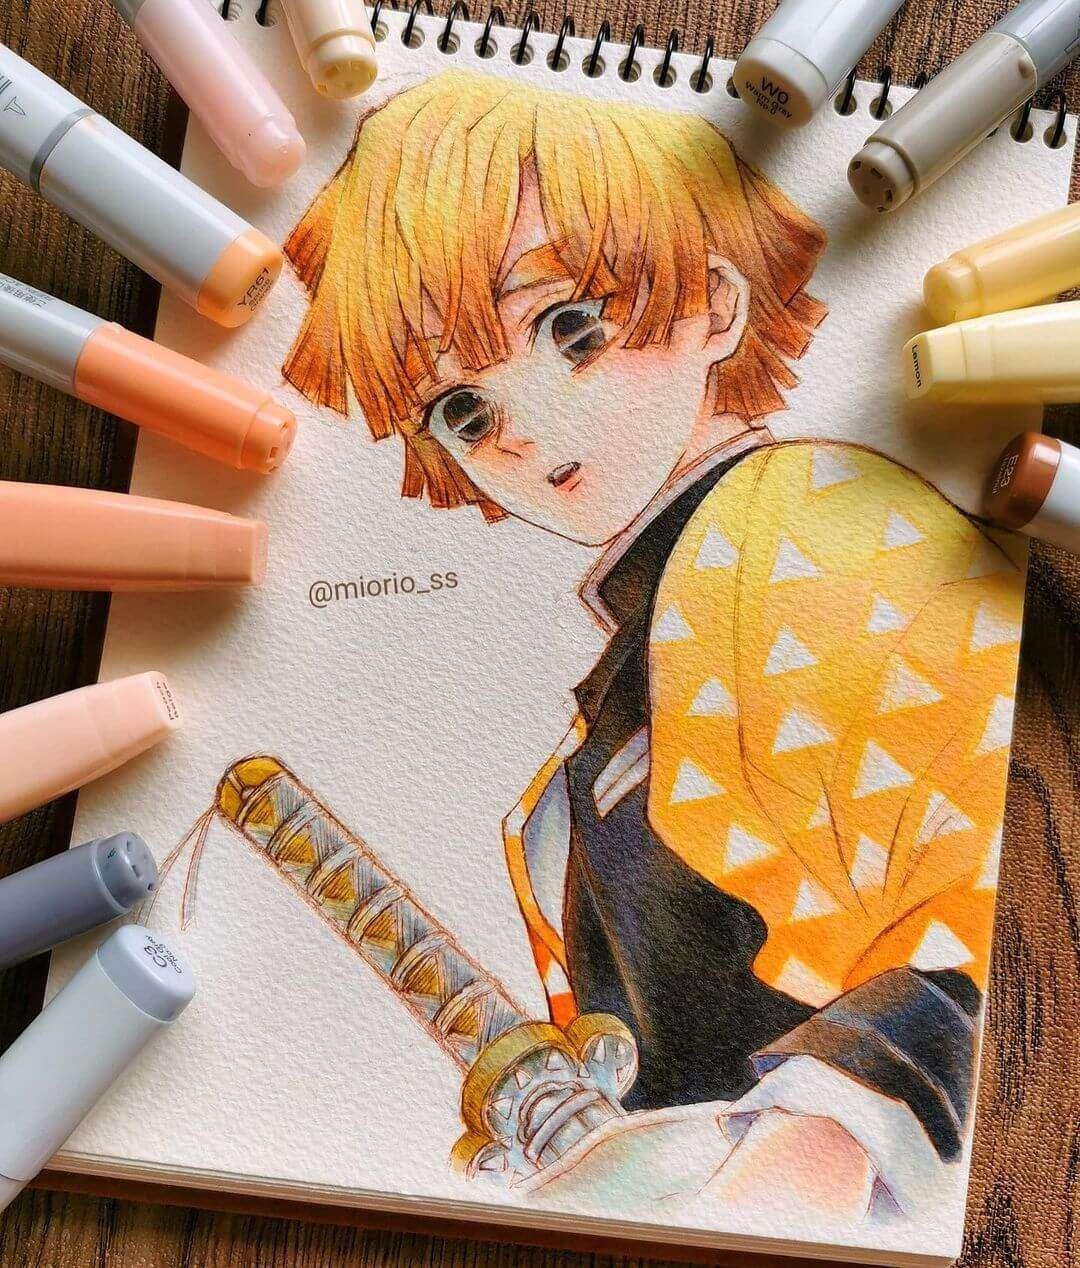 Zenitsu (Demon Slayer) by miorio_ss Anime Art of the Week